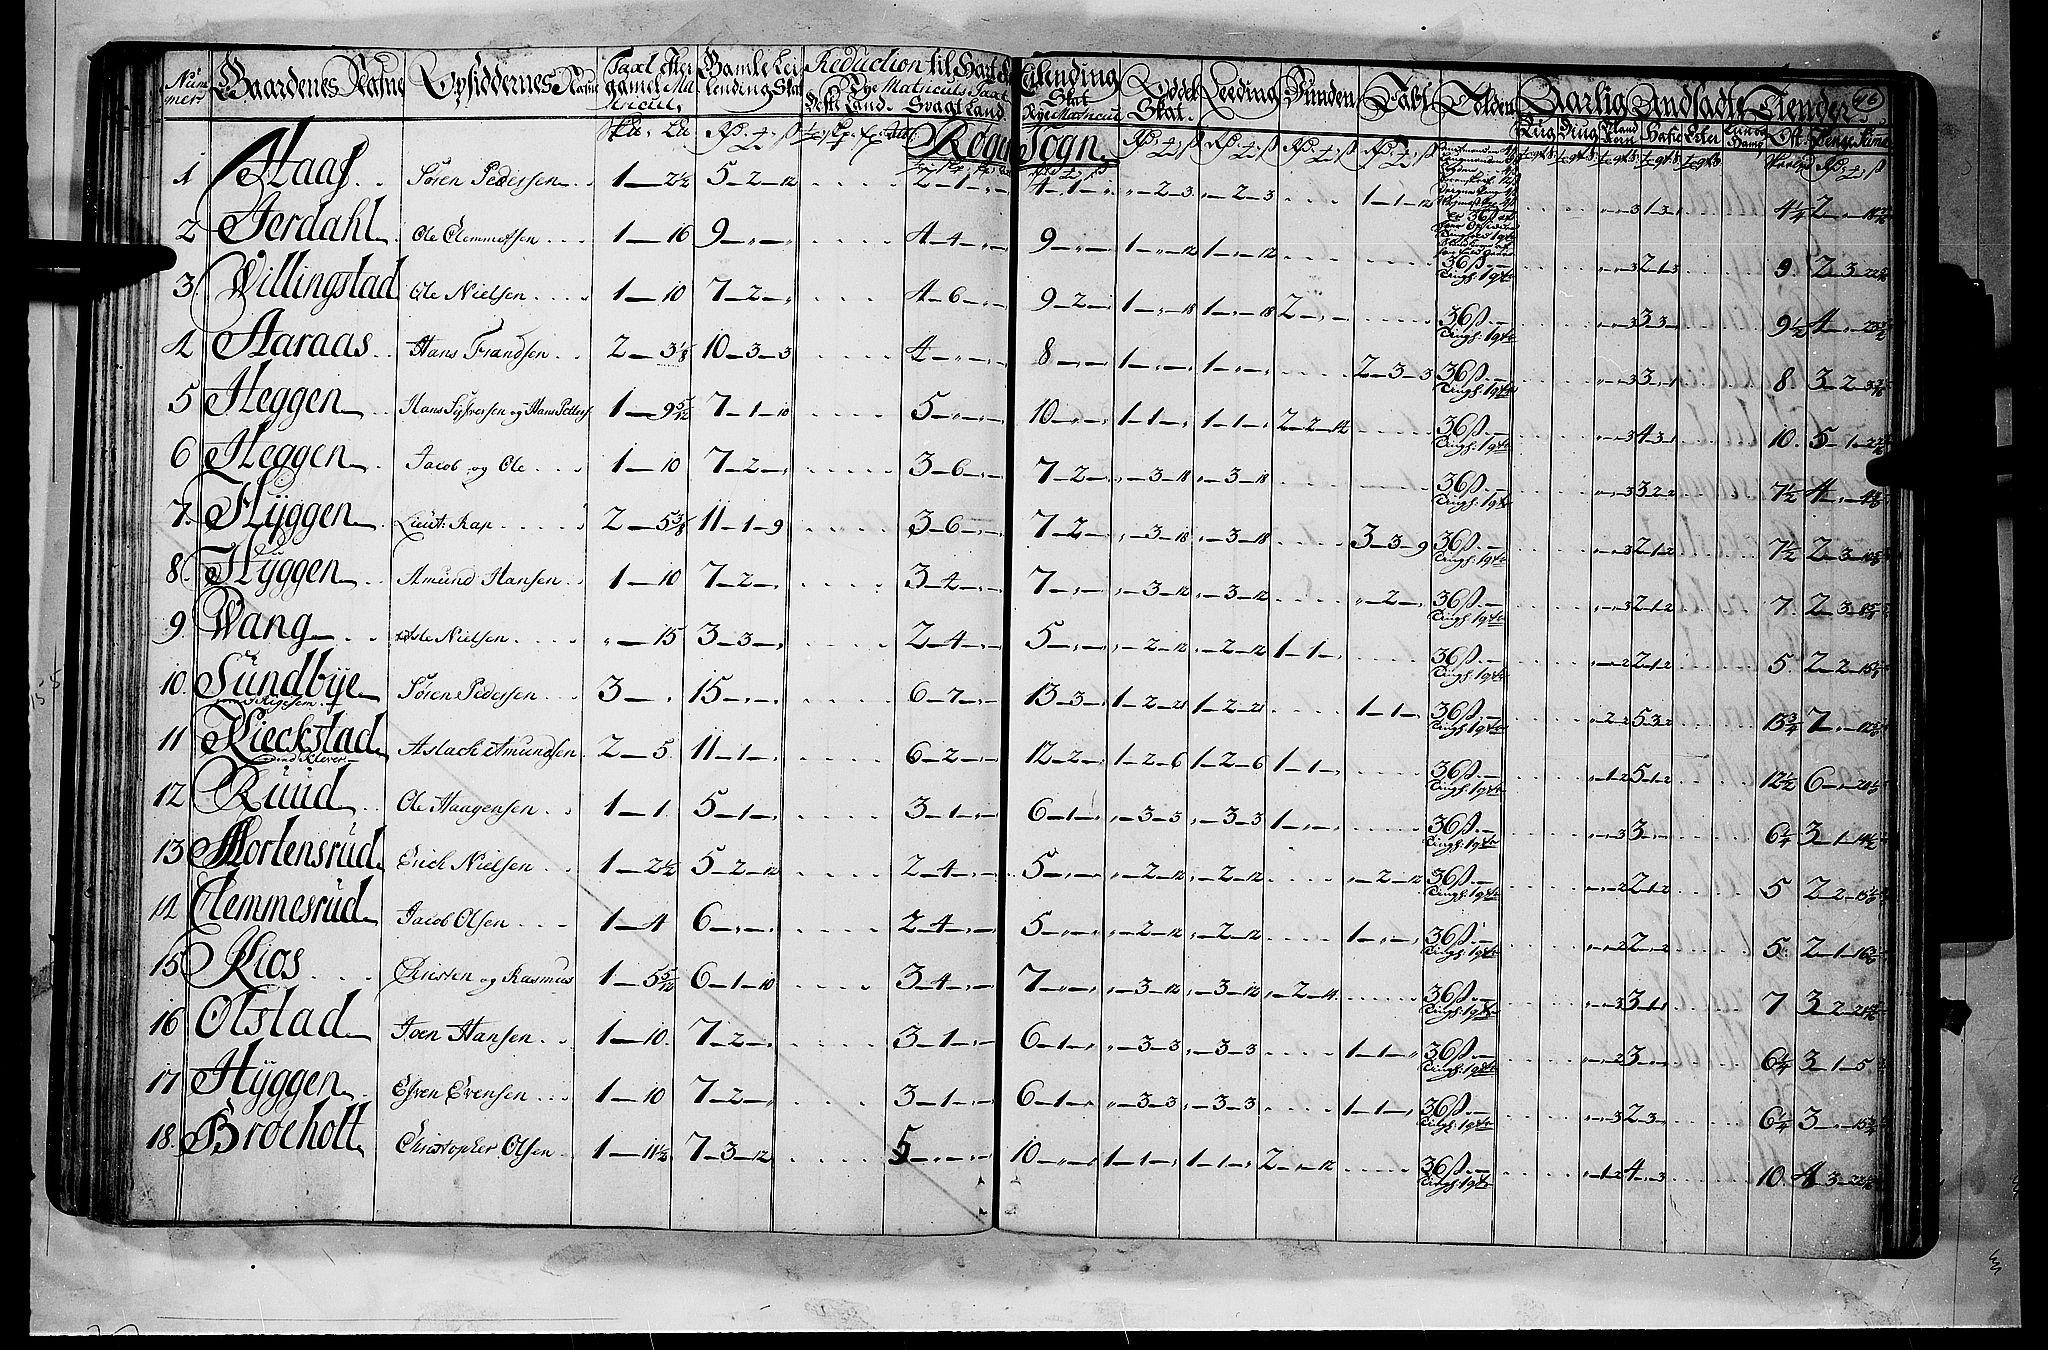 RA, Rentekammeret inntil 1814, Realistisk ordnet avdeling, N/Nb/Nbf/L0112: Buskerud matrikkelprotokoll, 1723, s. 45b-46a